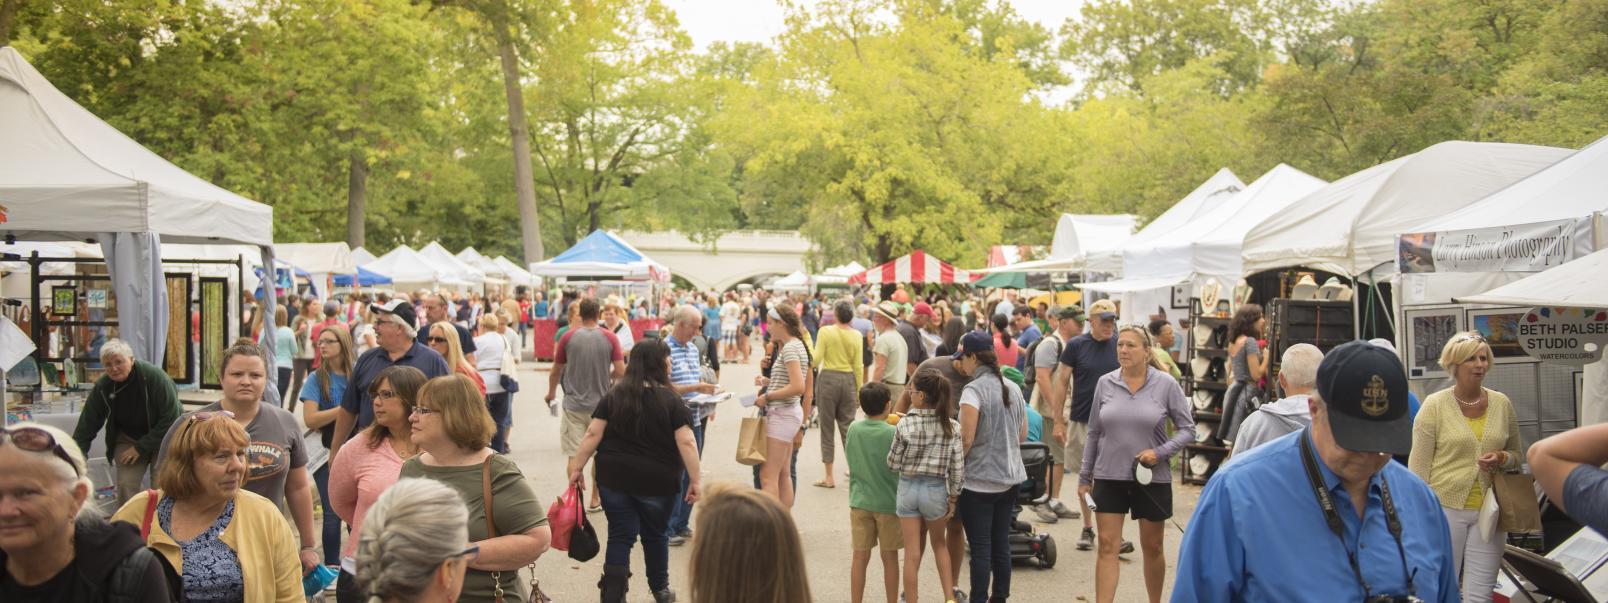 Hagley Craft Fair In Wilmington De October 2019 Event Details